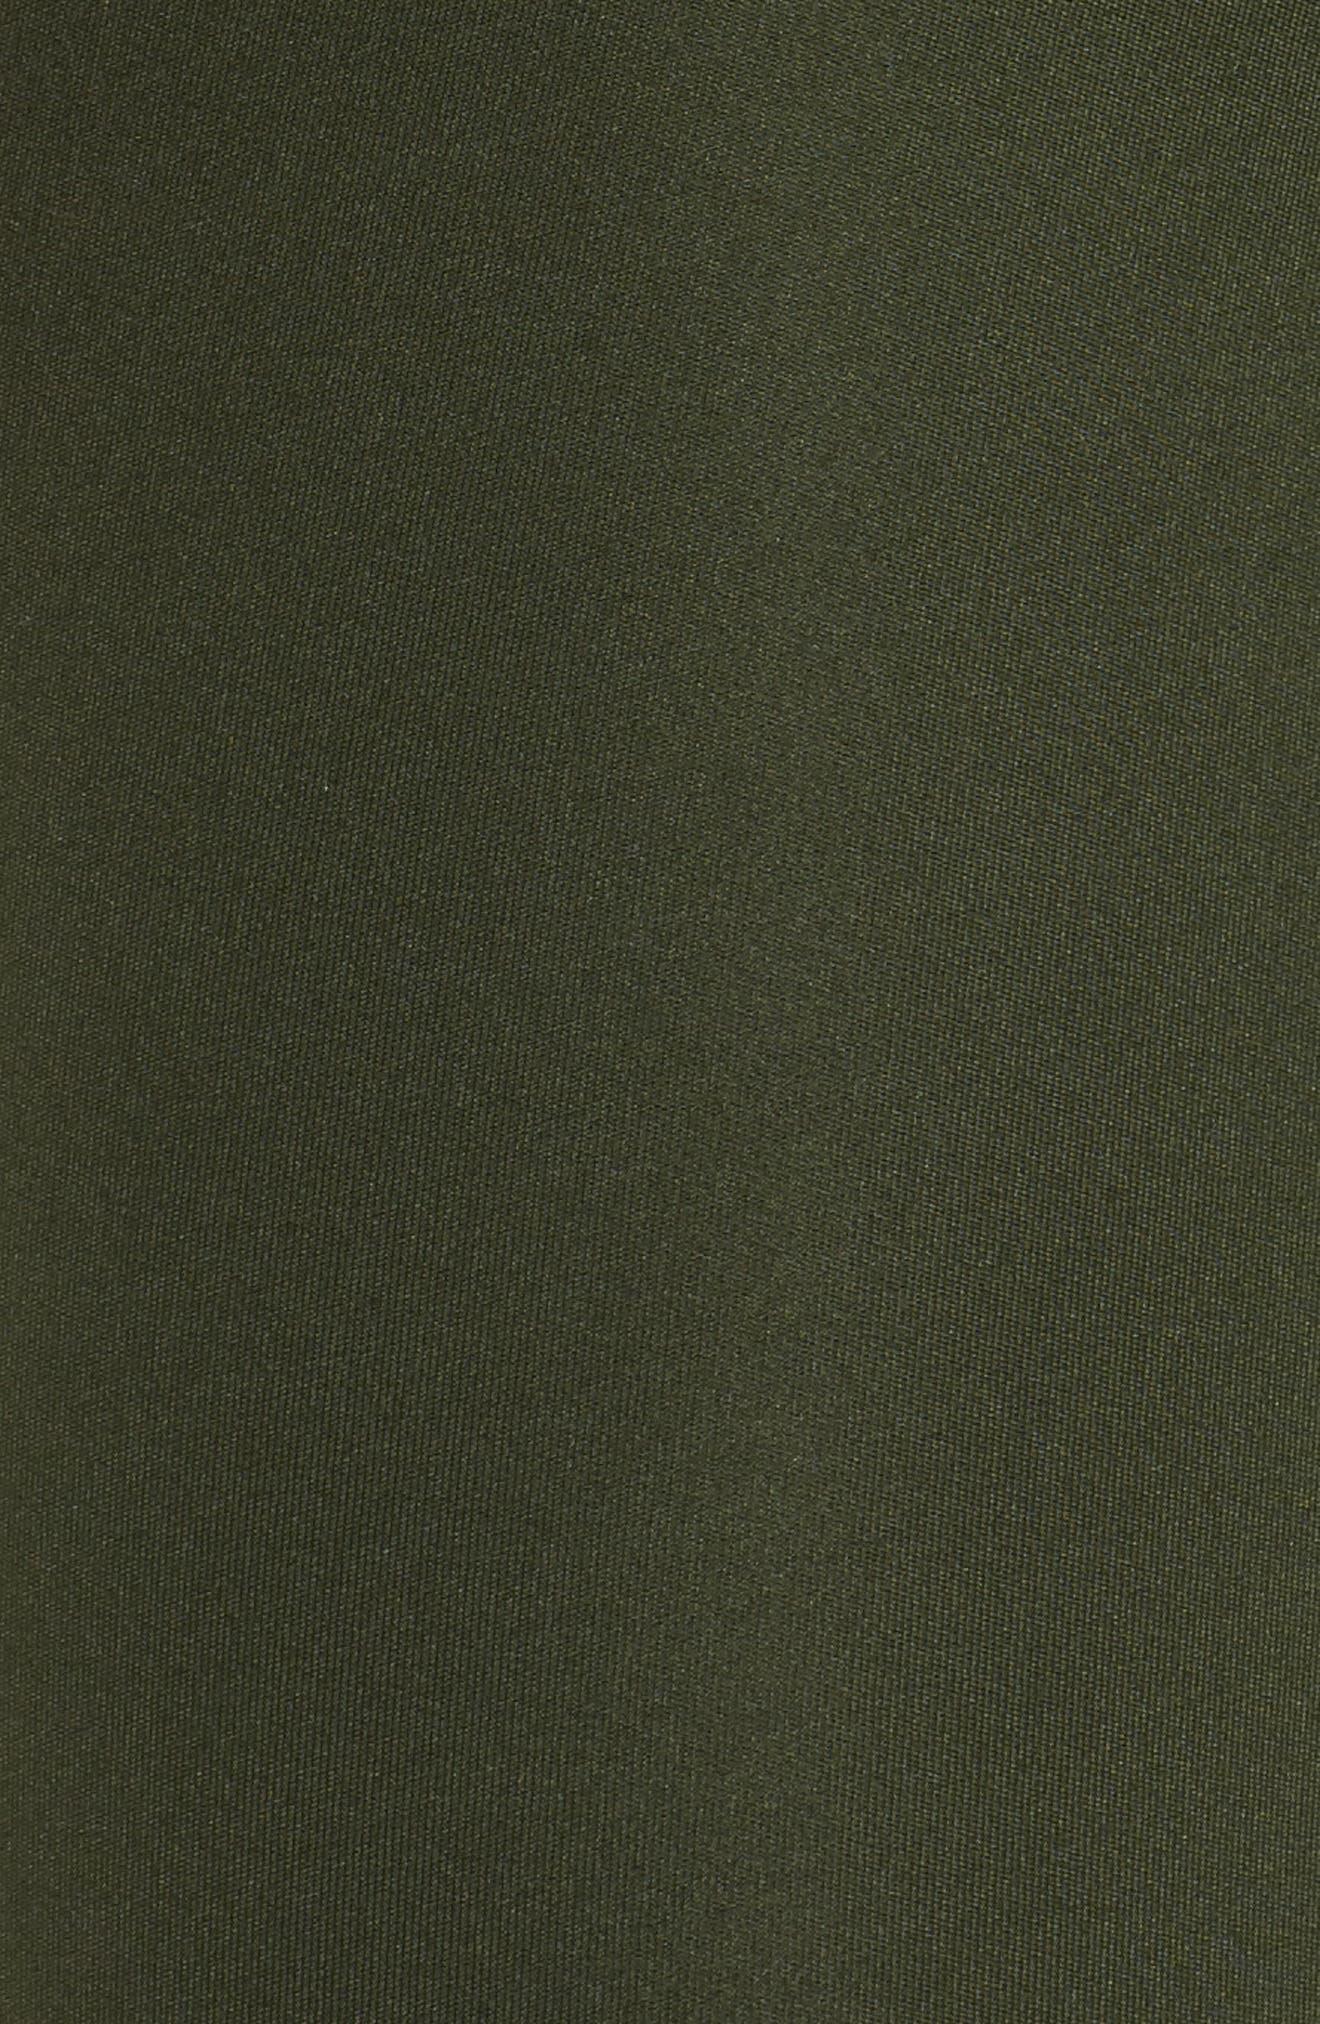 Mesh Lace-Up Leggings,                             Alternate thumbnail 6, color,                             310